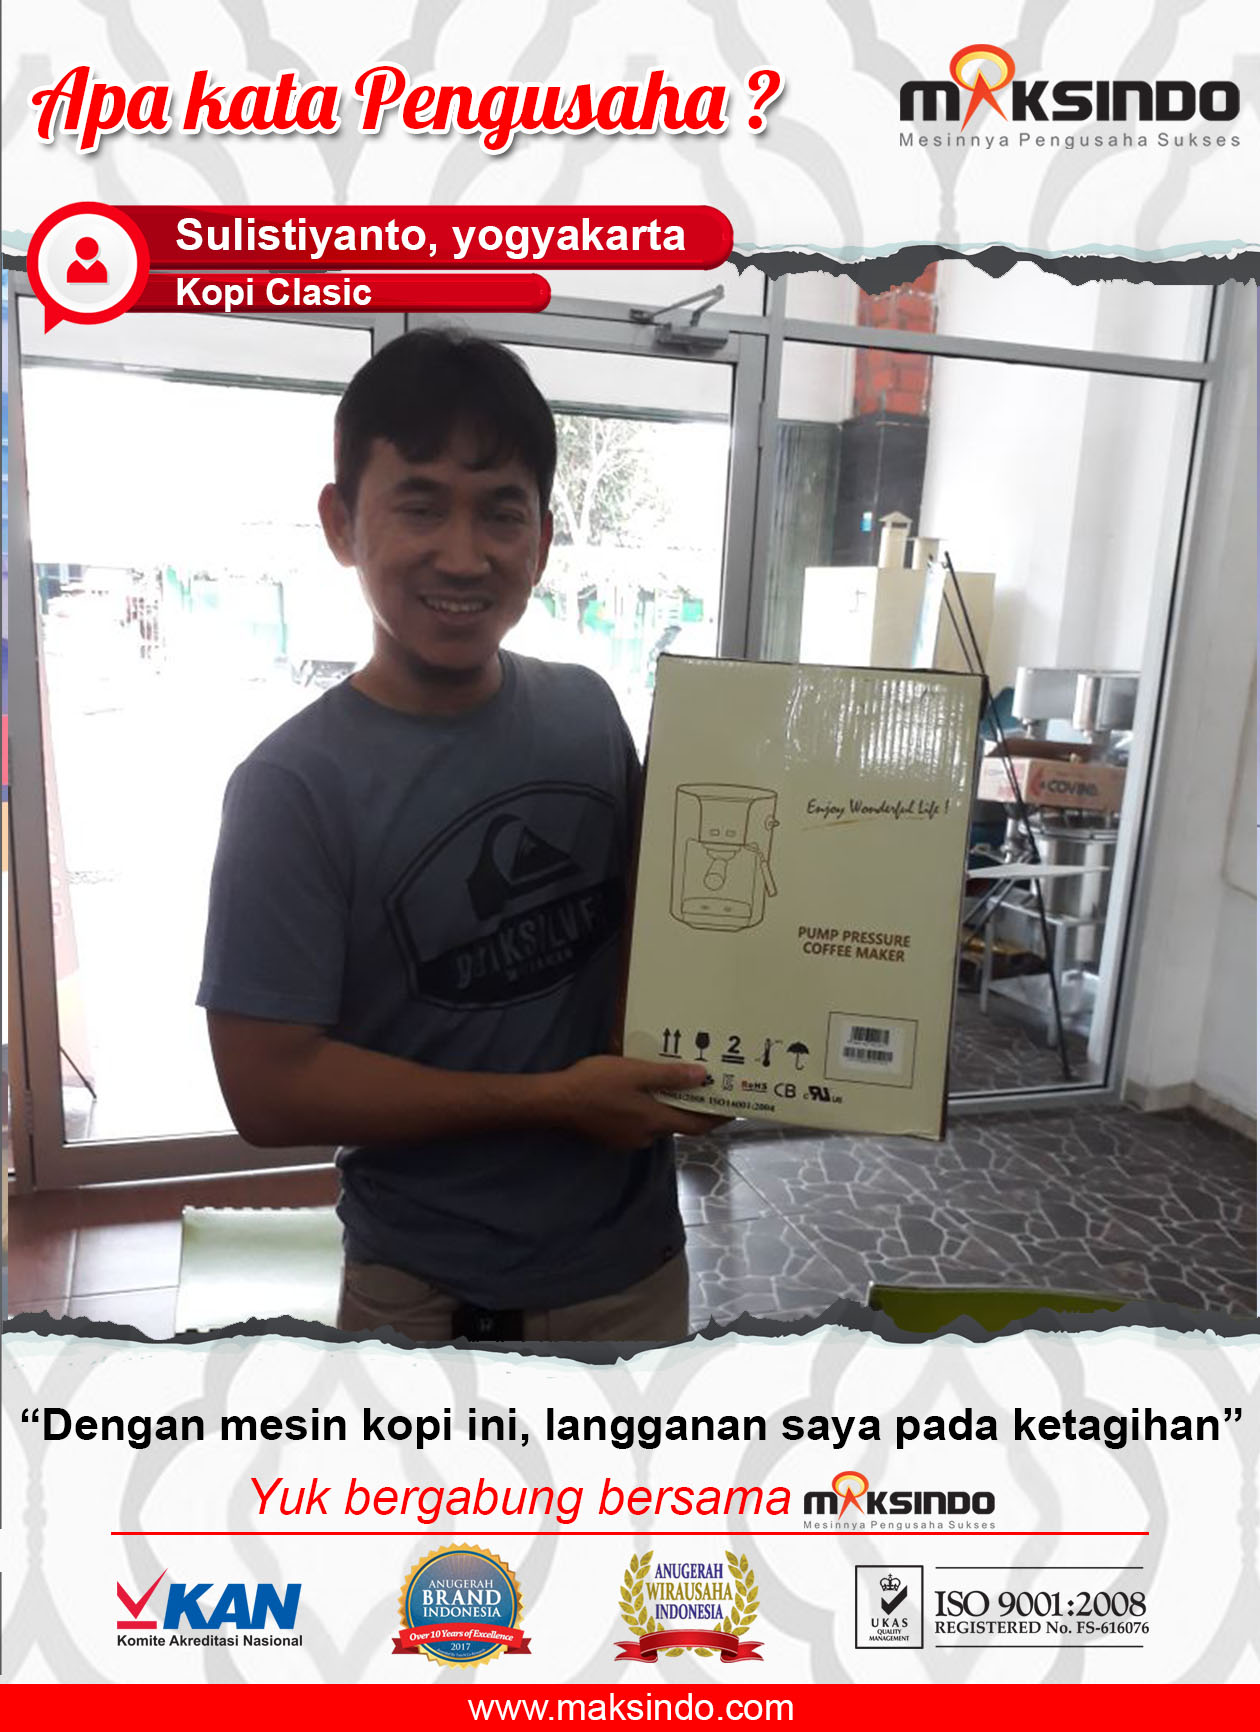 Kopi Clasic : Usaha Saya Makin Lancar, Pelanggan Makin Ketagihan Berkat Mesin Kopi dari Maksindo